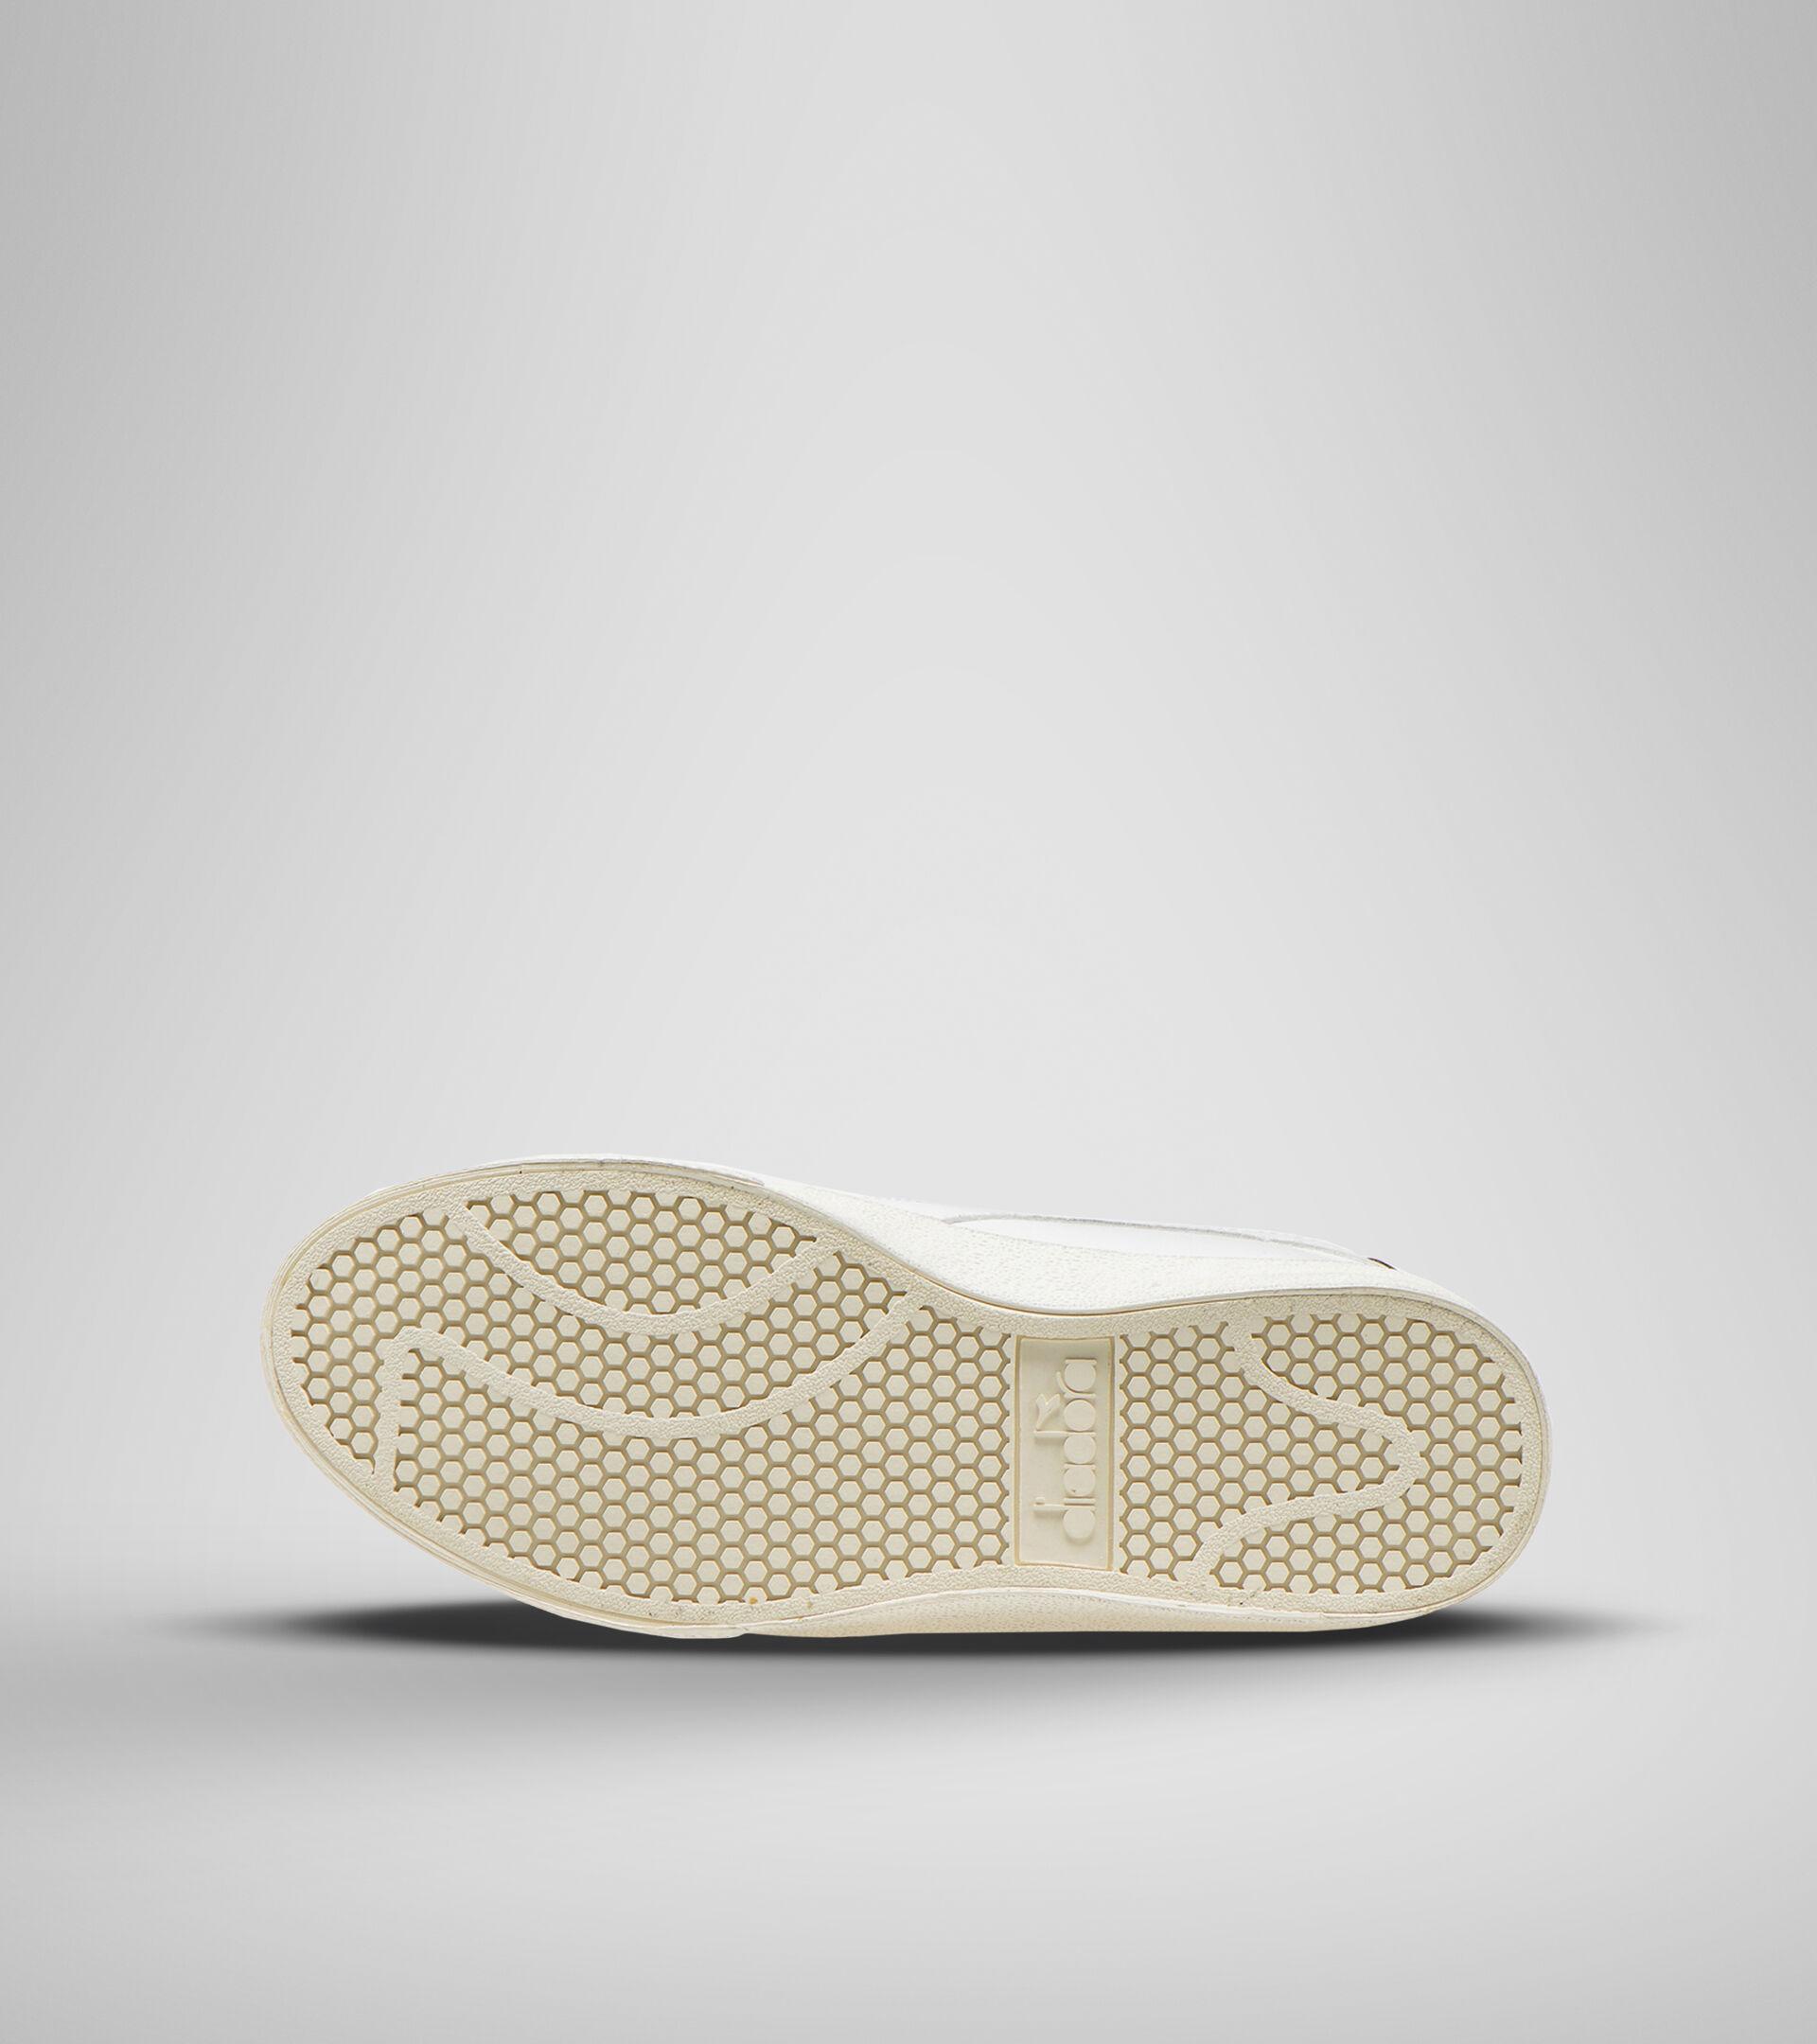 Footwear Sportswear UNISEX MELODY LEATHER DIRTY BIANCO/BLU CORSARO Diadora